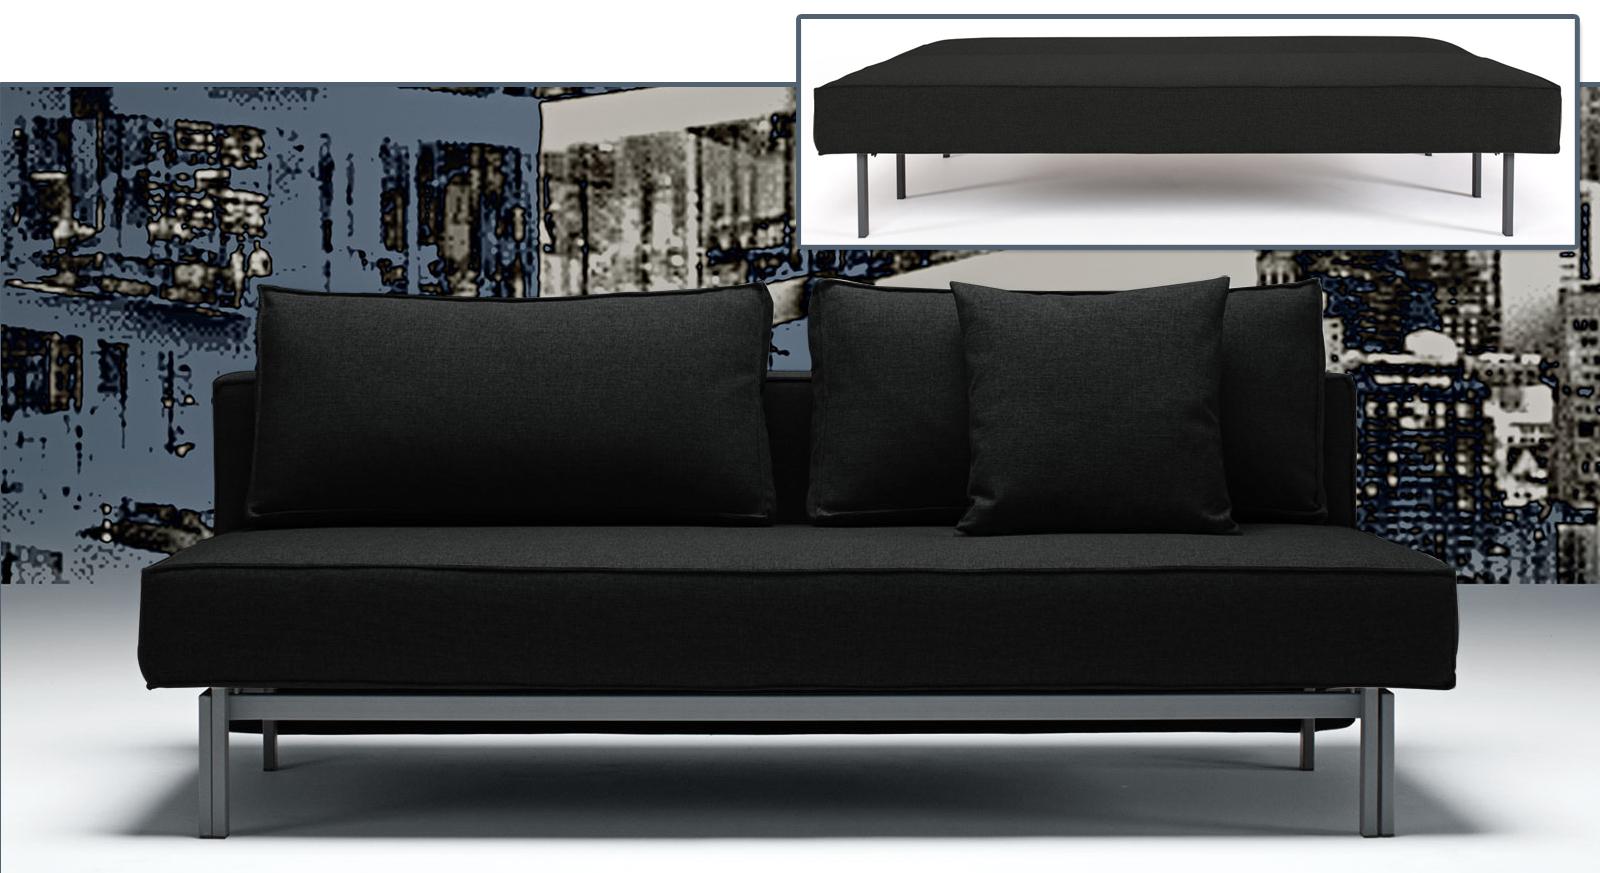 schlafsofa gro e liegefl che m belideen. Black Bedroom Furniture Sets. Home Design Ideas